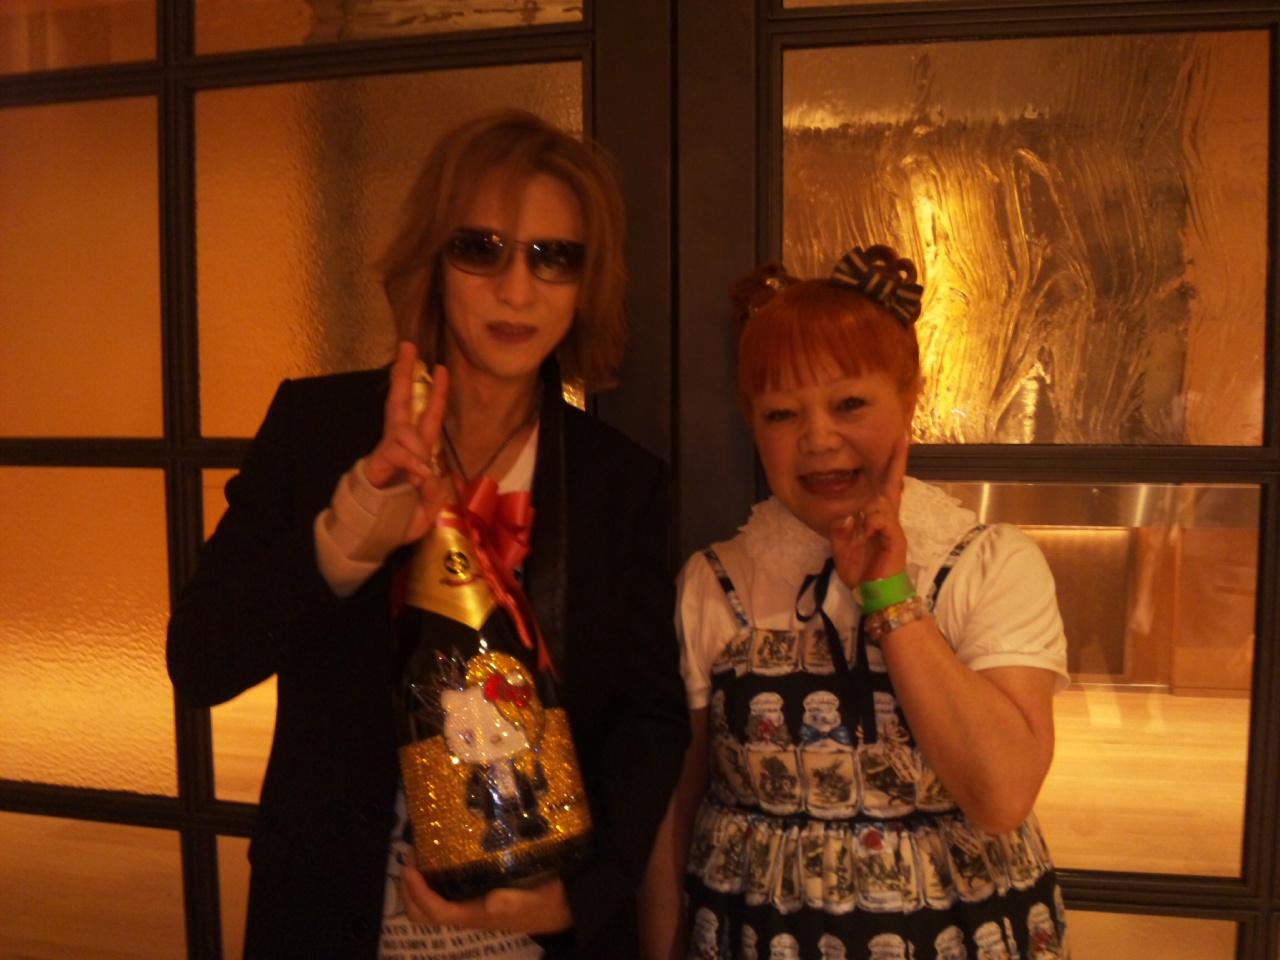 YOSHIKIさんディナーショー!